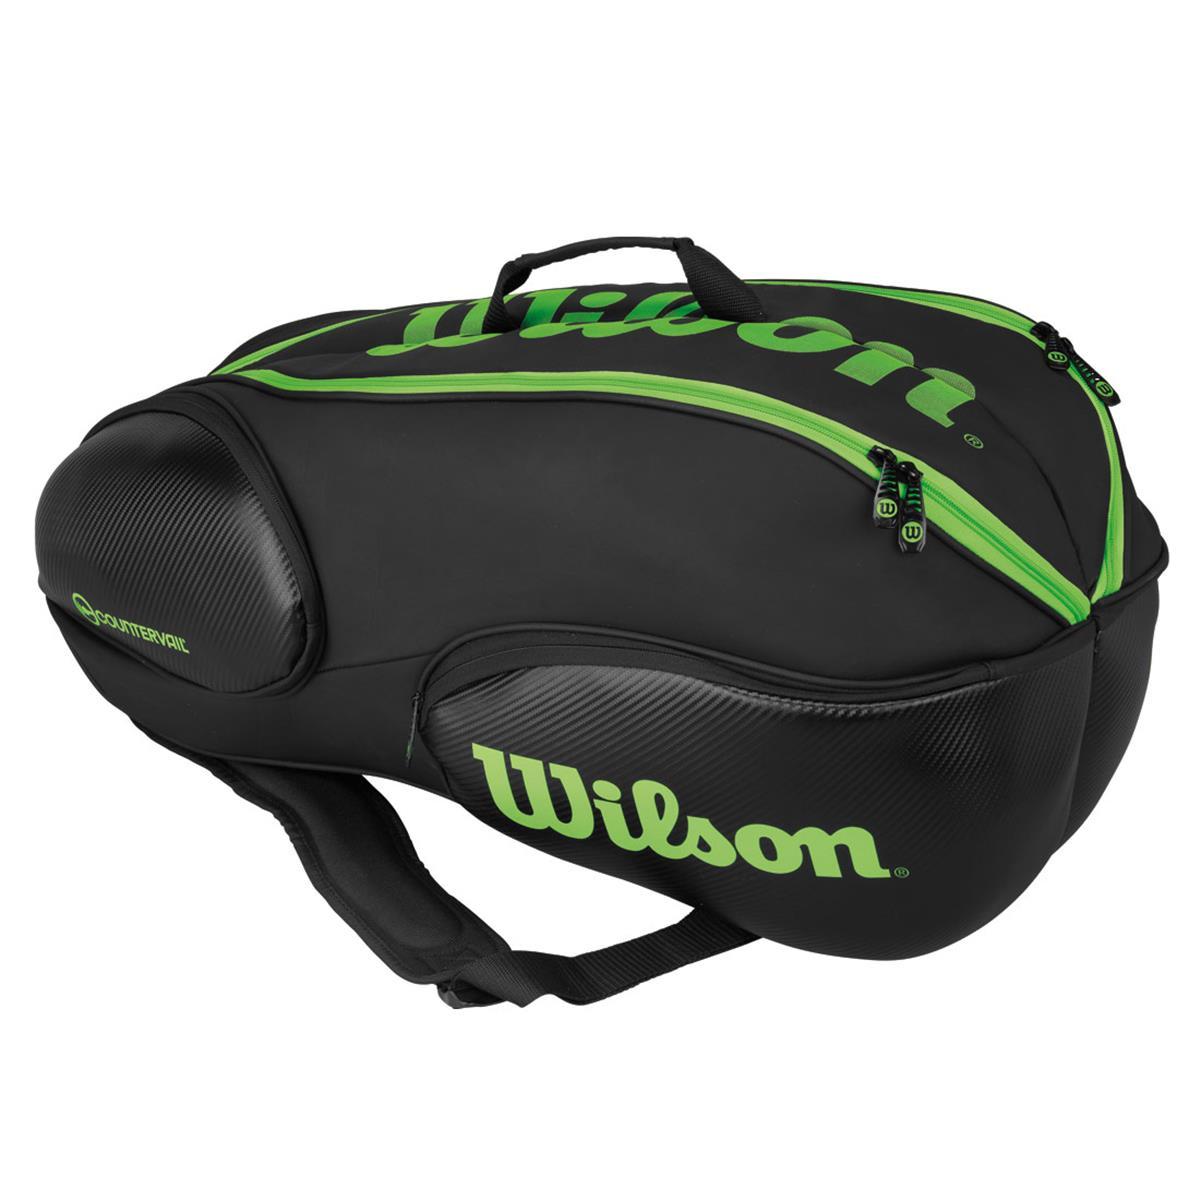 Wilson Blade 9 Racket Bag